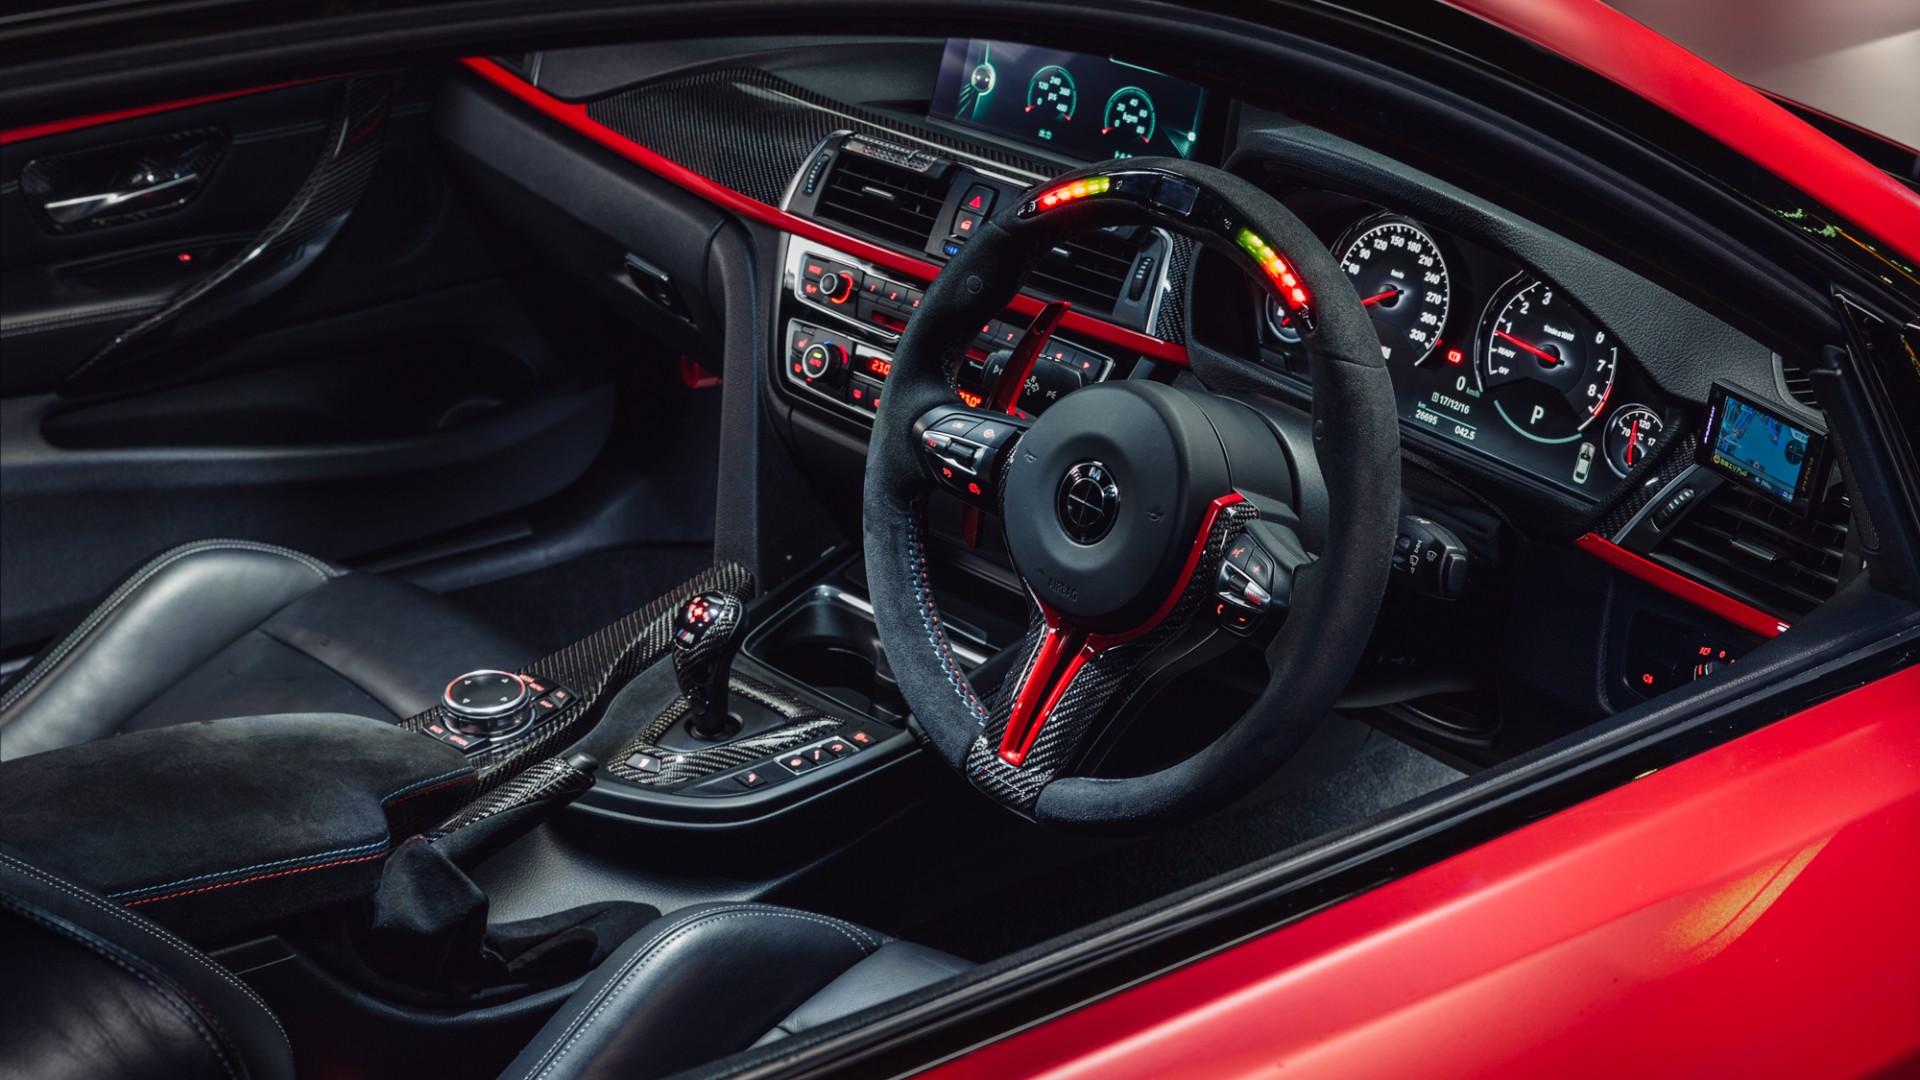 BMW M4 Interior Wallpaper | HD Car Wallpapers | ID #11792